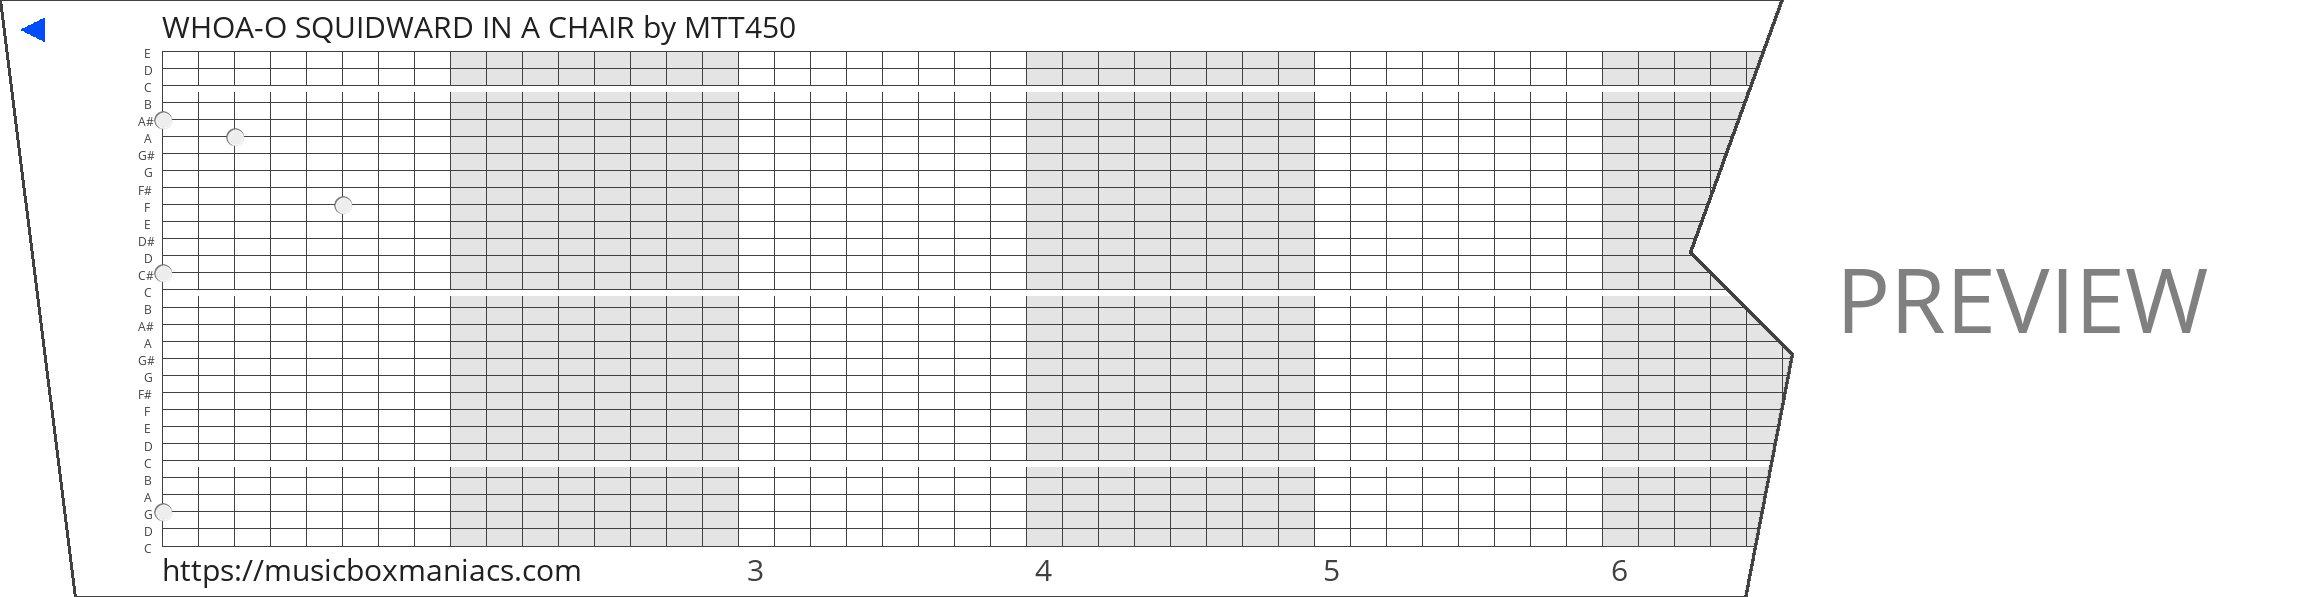 WHOA-O SQUIDWARD IN A CHAIR 30 note music box paper strip